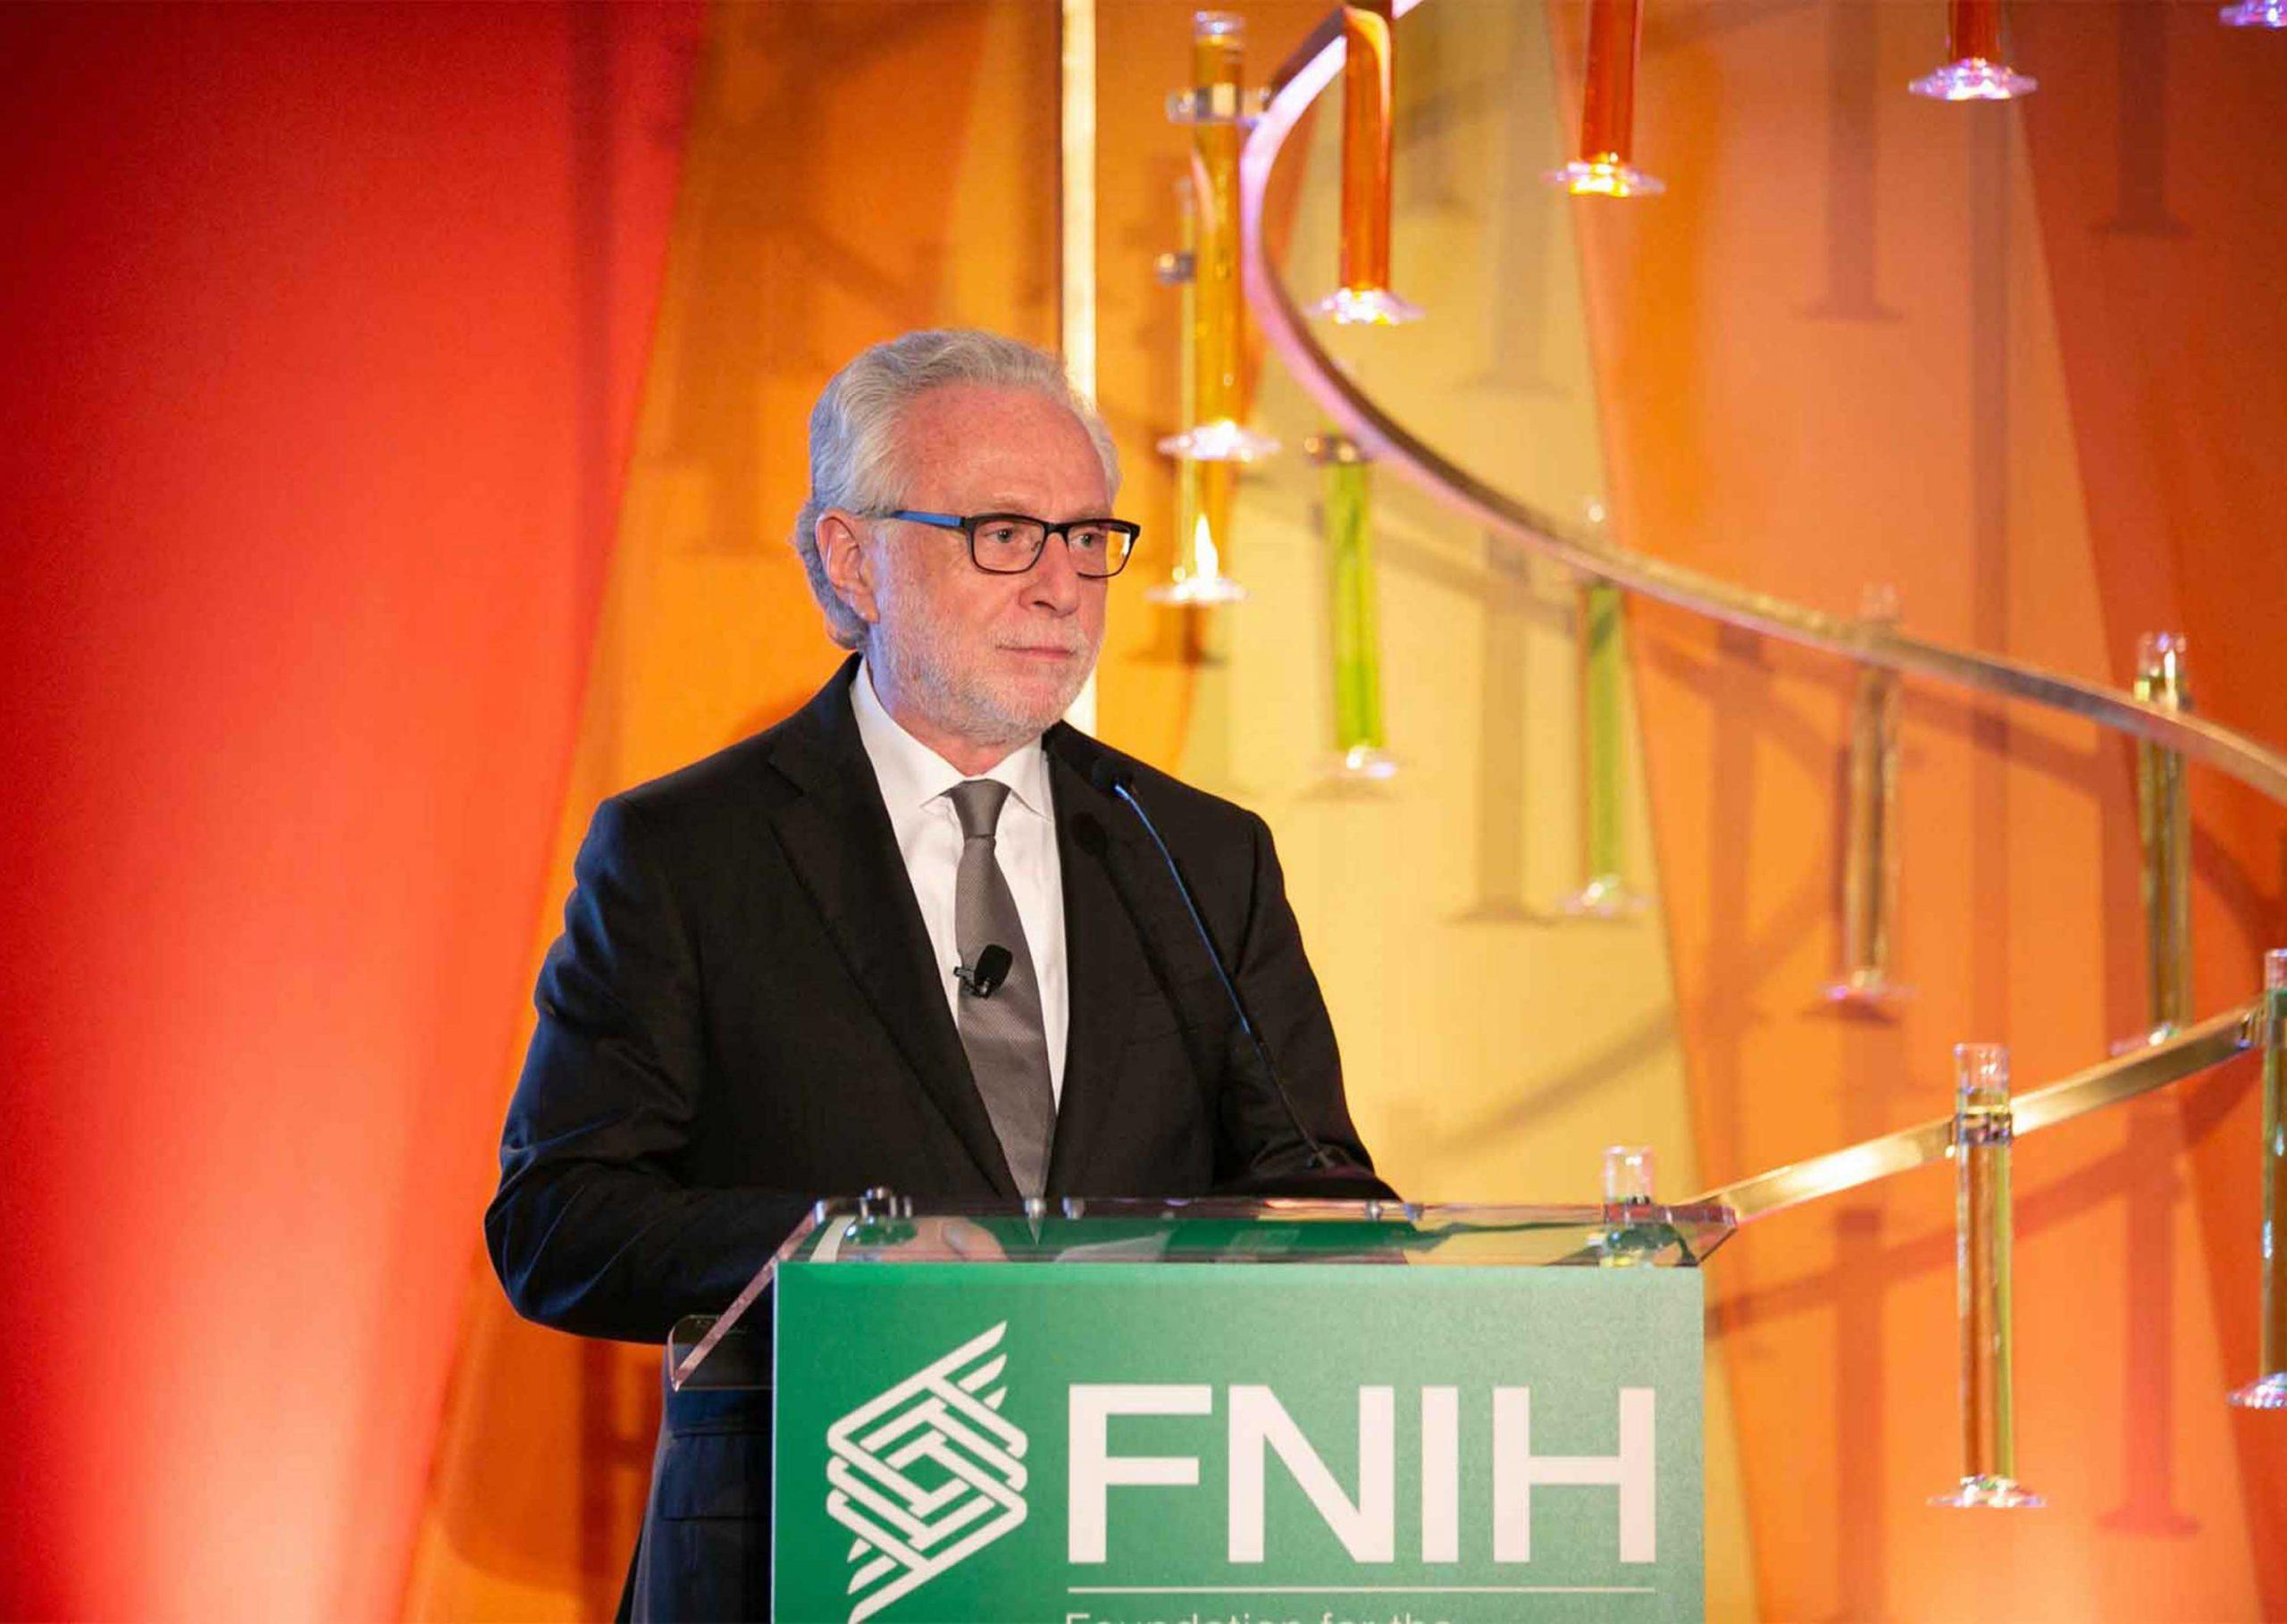 FNIH-award-ceremony-event-branding-annapolis-washington-dc-digital-palette